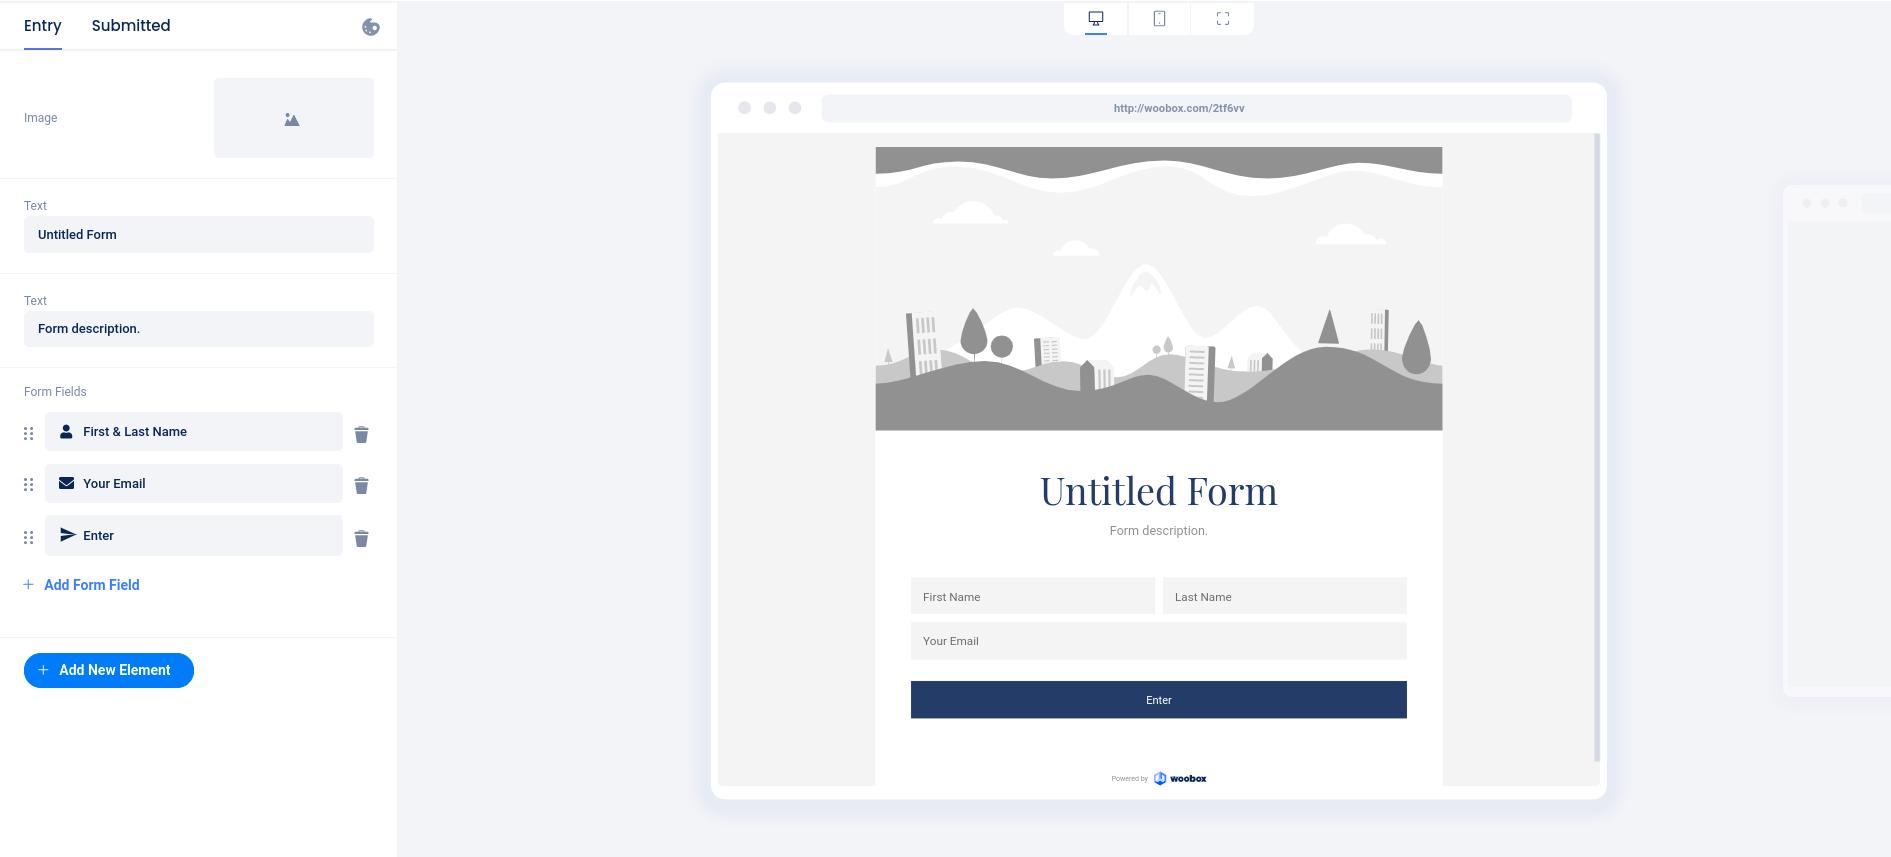 Form Design tab